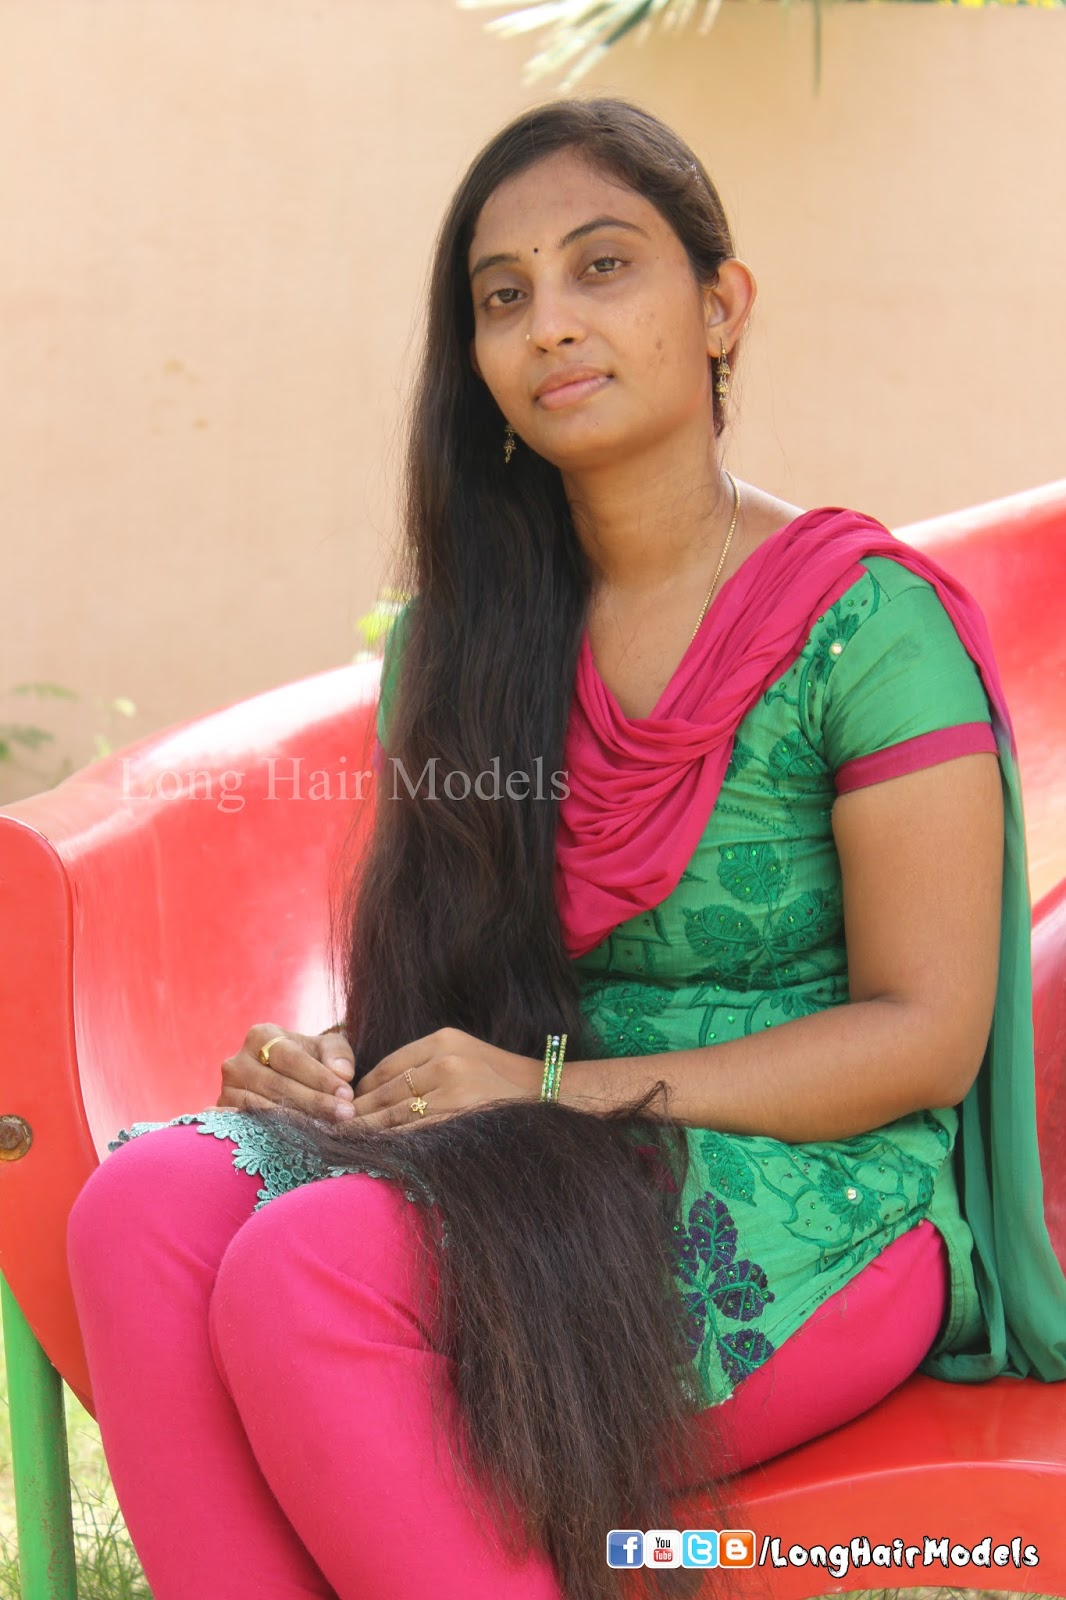 HAIR CARES & STYLES: MODEL HARITHA | LONG HAIR MODELS  HAIR CARES & ST...